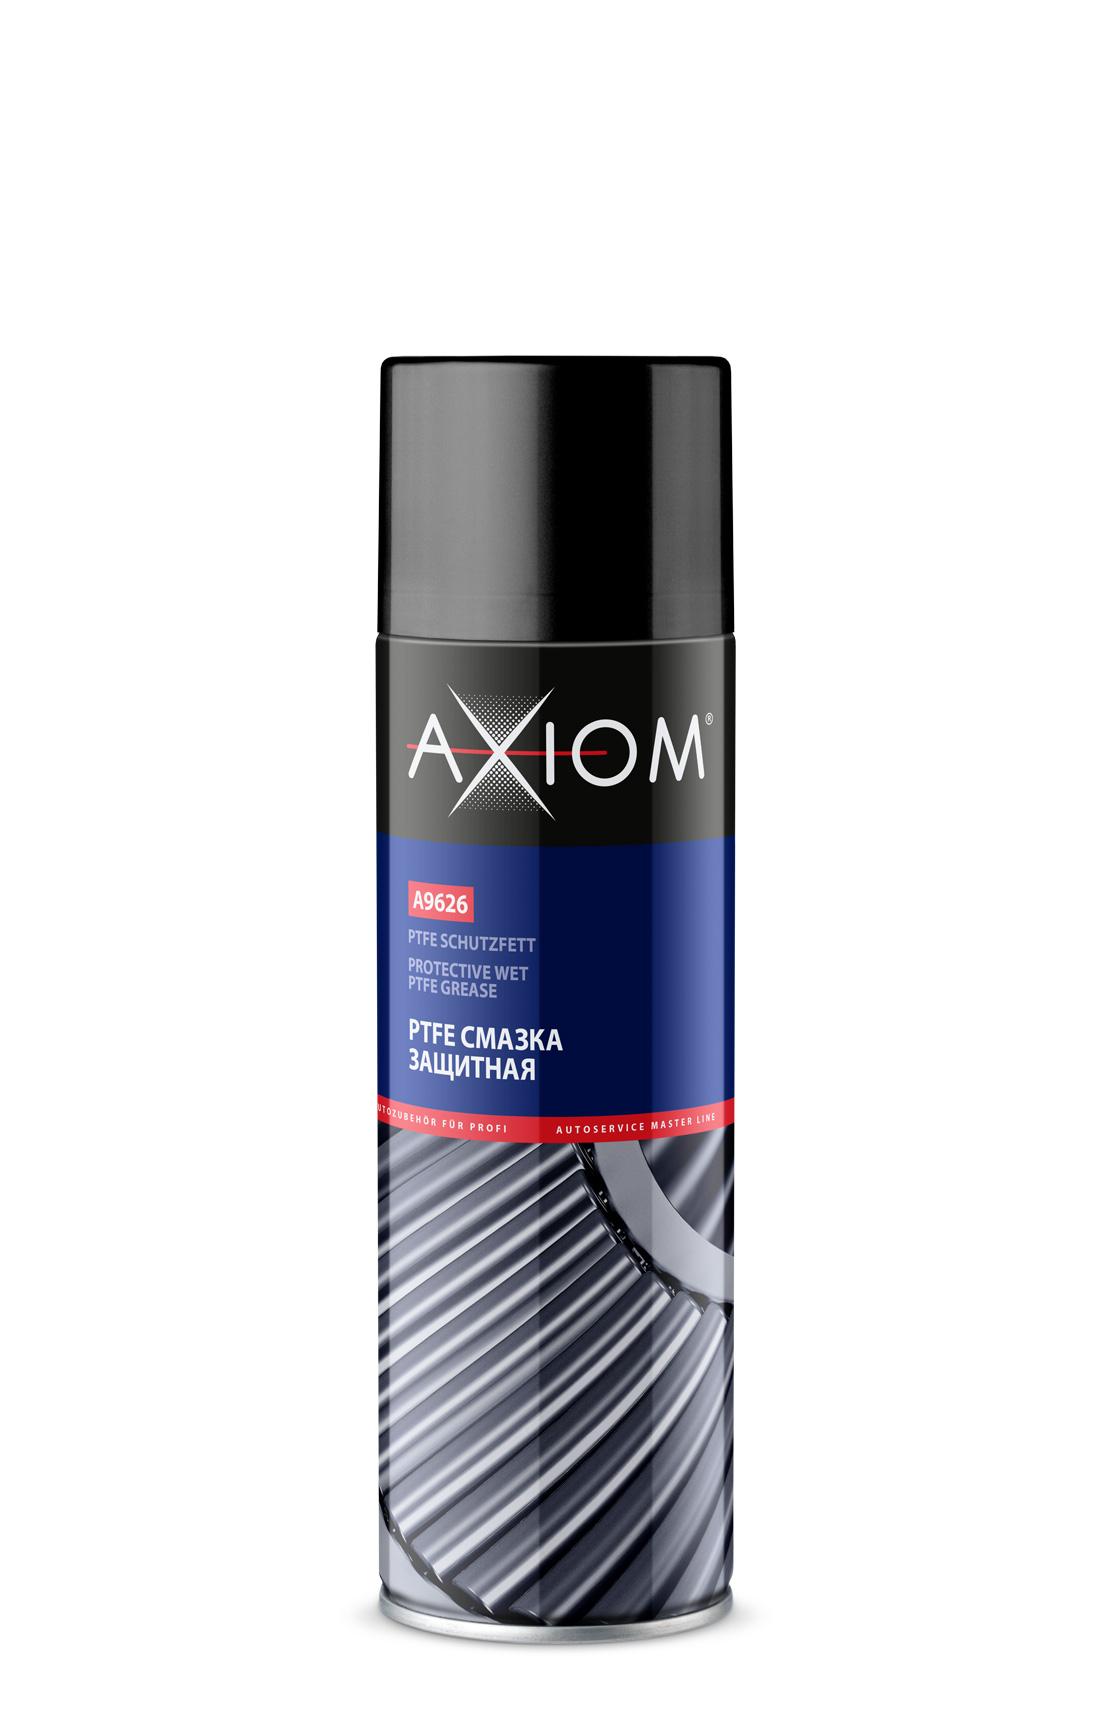 PTFE смазка защитная AXIOM